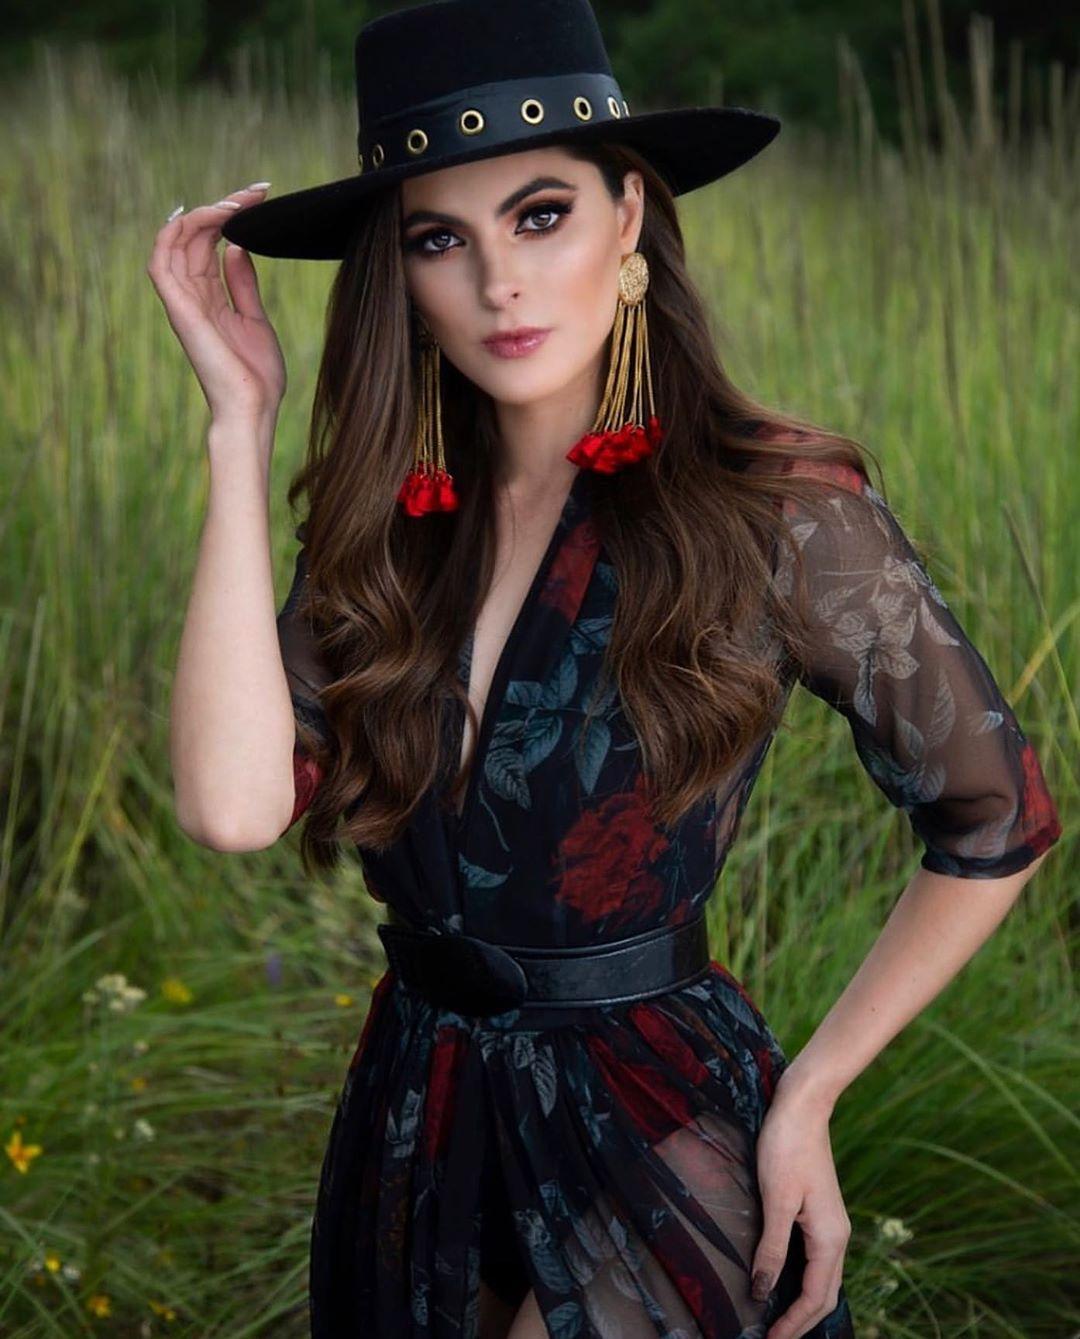 sofia aragon, 2nd runner-up de miss universe 2019. - Página 2 75439511